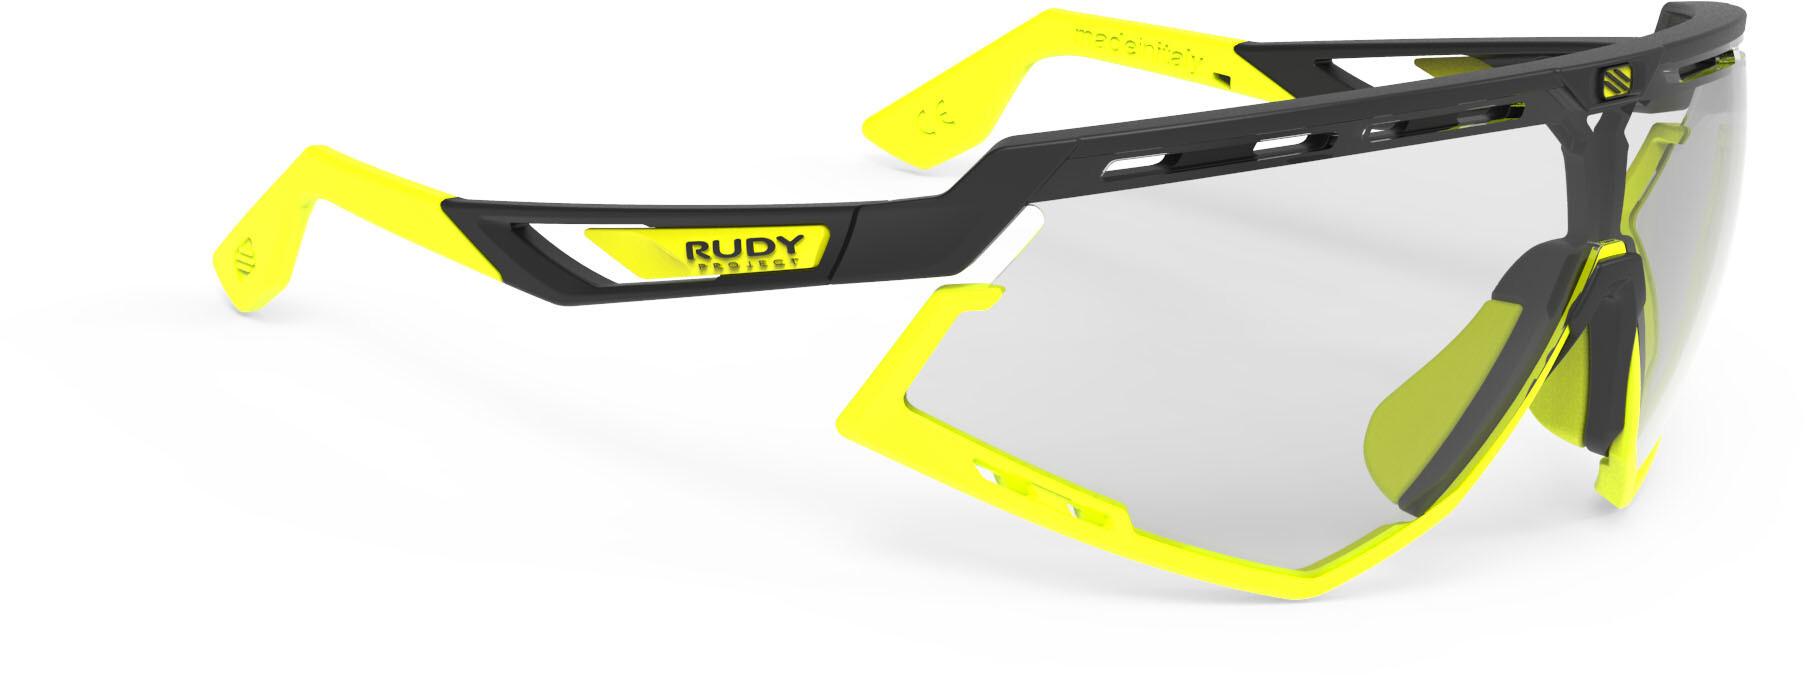 d434fd76824 Rudy Project Defender Lunettes, black matte/yellow fluo - impactx  photochromic 2 laser black